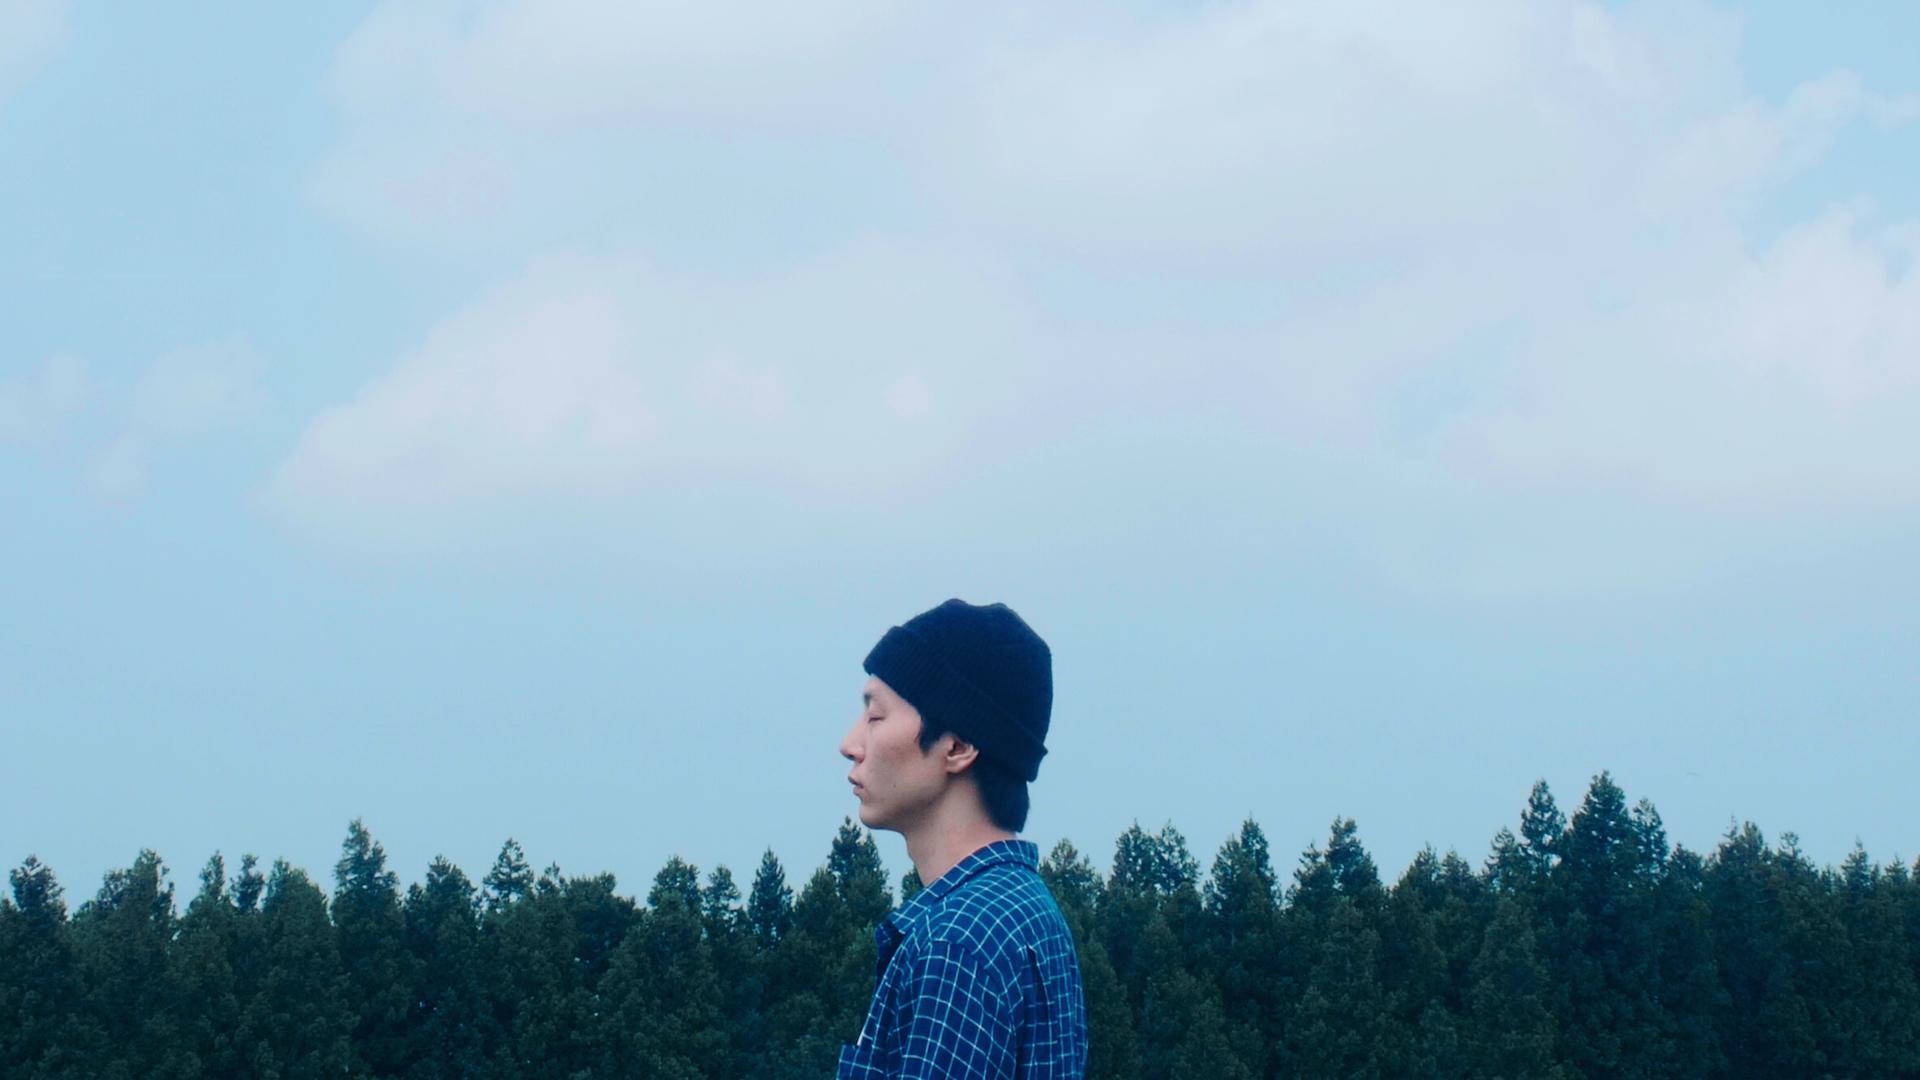 [MV] 조형우 Cho Hyung Woo - 후회 Regret